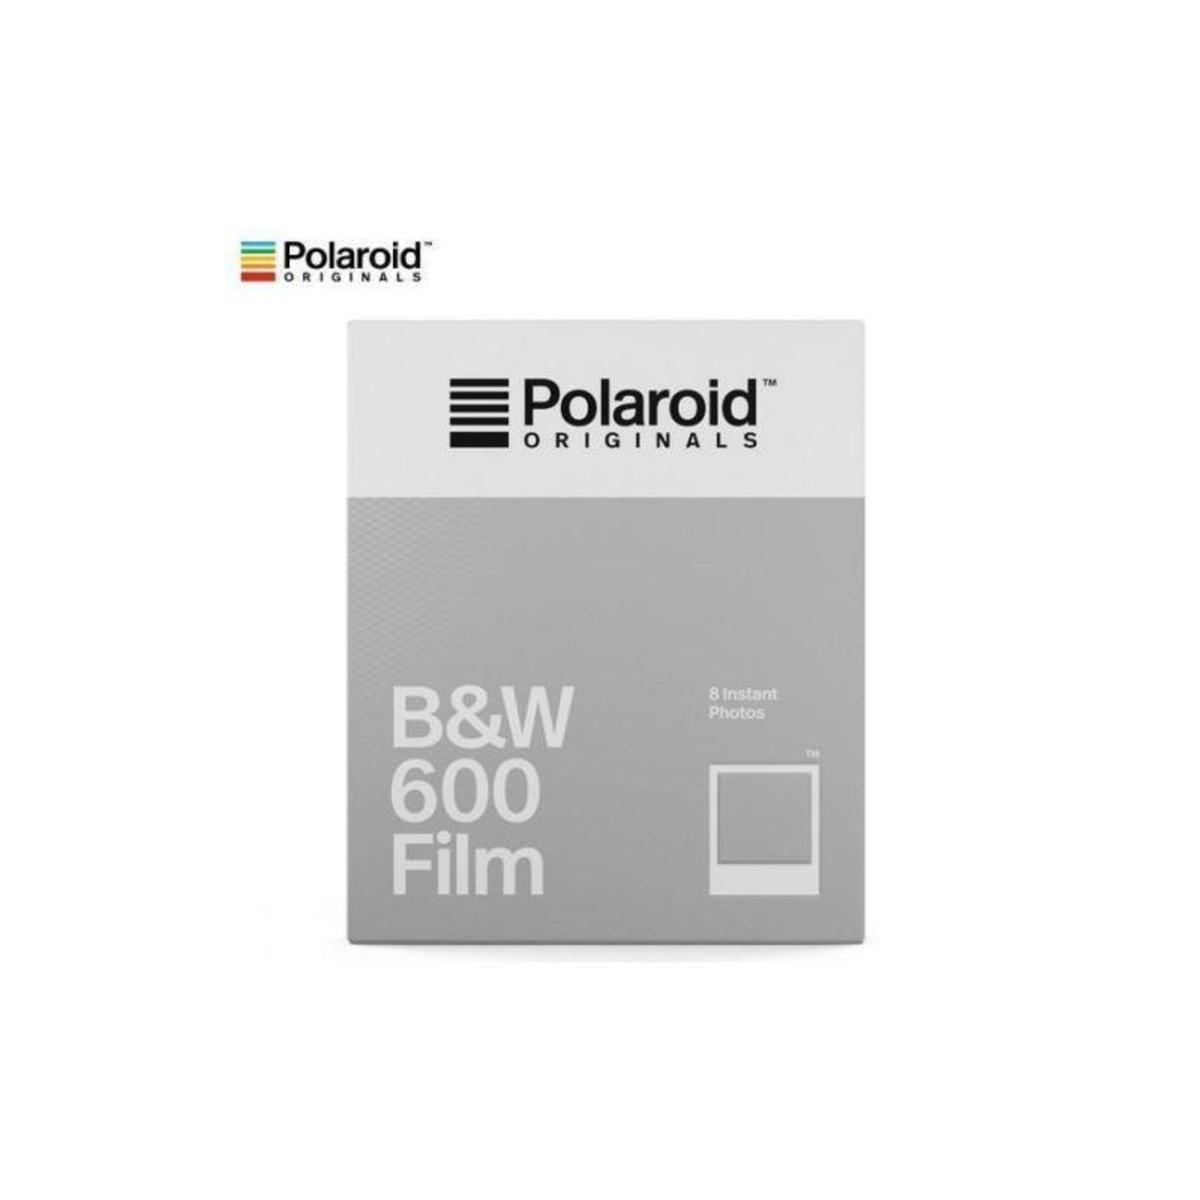 B&W Instant Film for 600